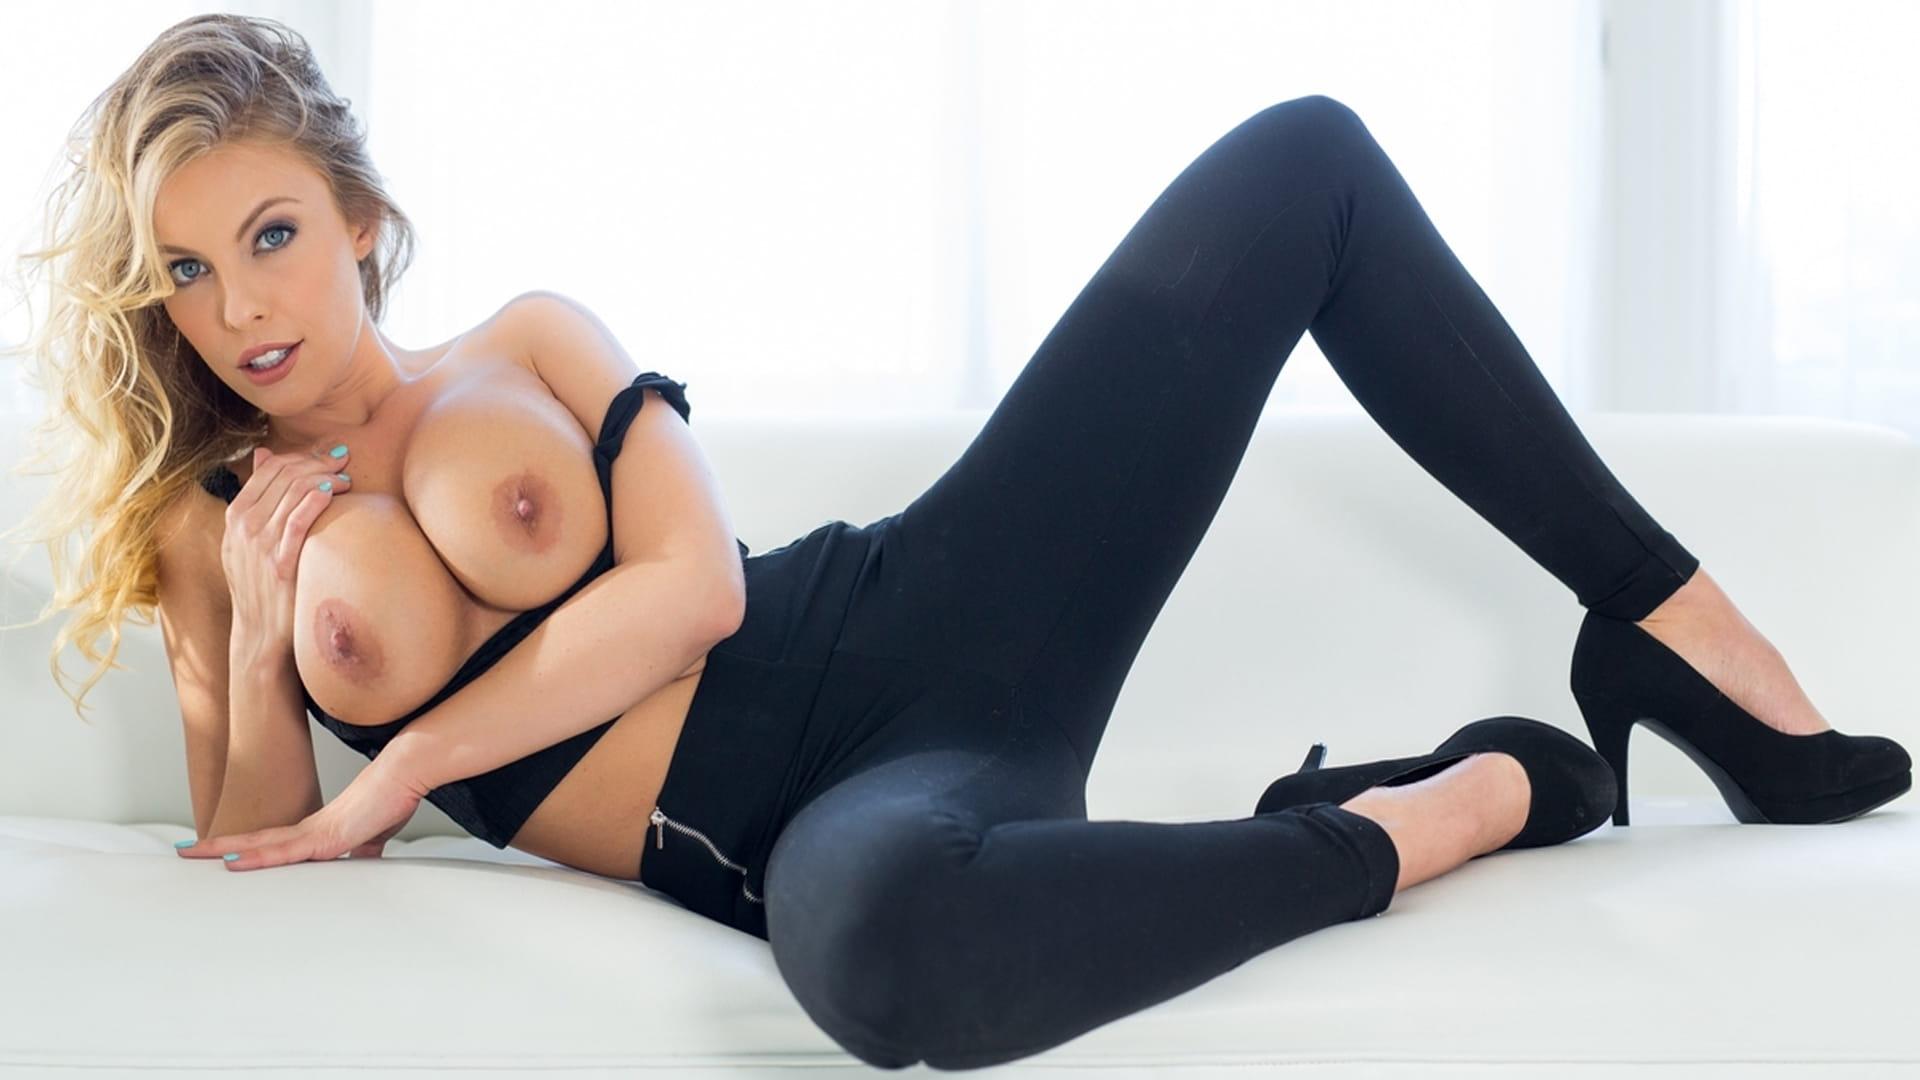 Privater Sexchat – ❤ Sex Storiessex-stories.info